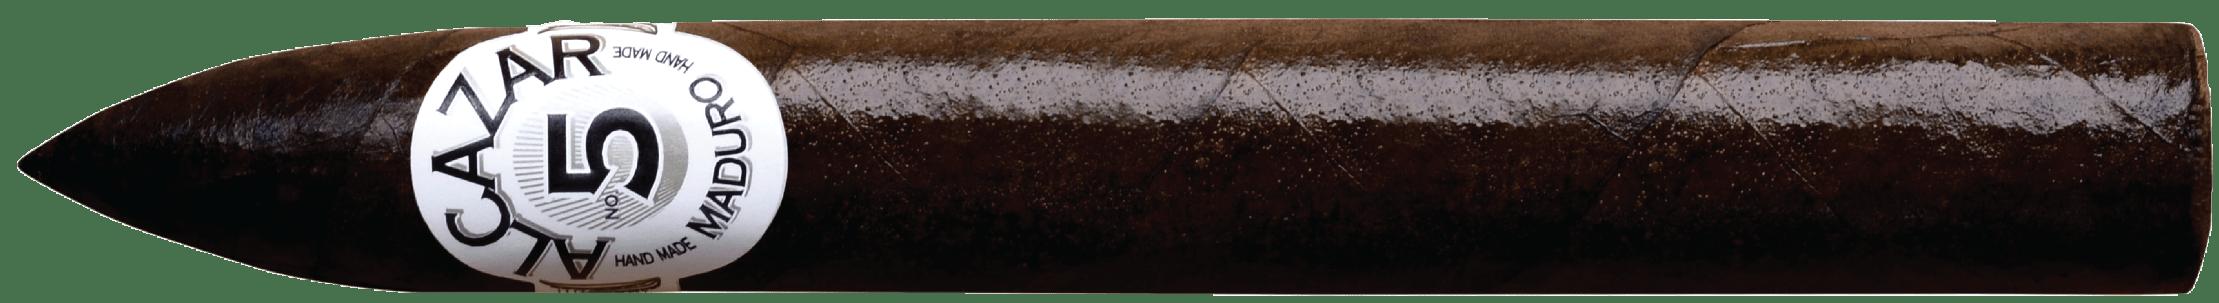 J.C. Newman Cigars Alcazar No. 5 Cigar Single